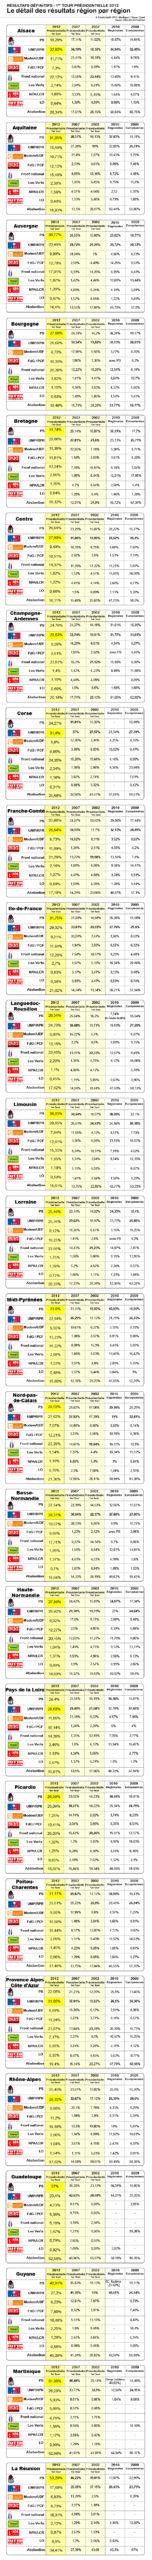 Definitifs-Presidentielle2012-detail-par-region_Plan_de_travail_1